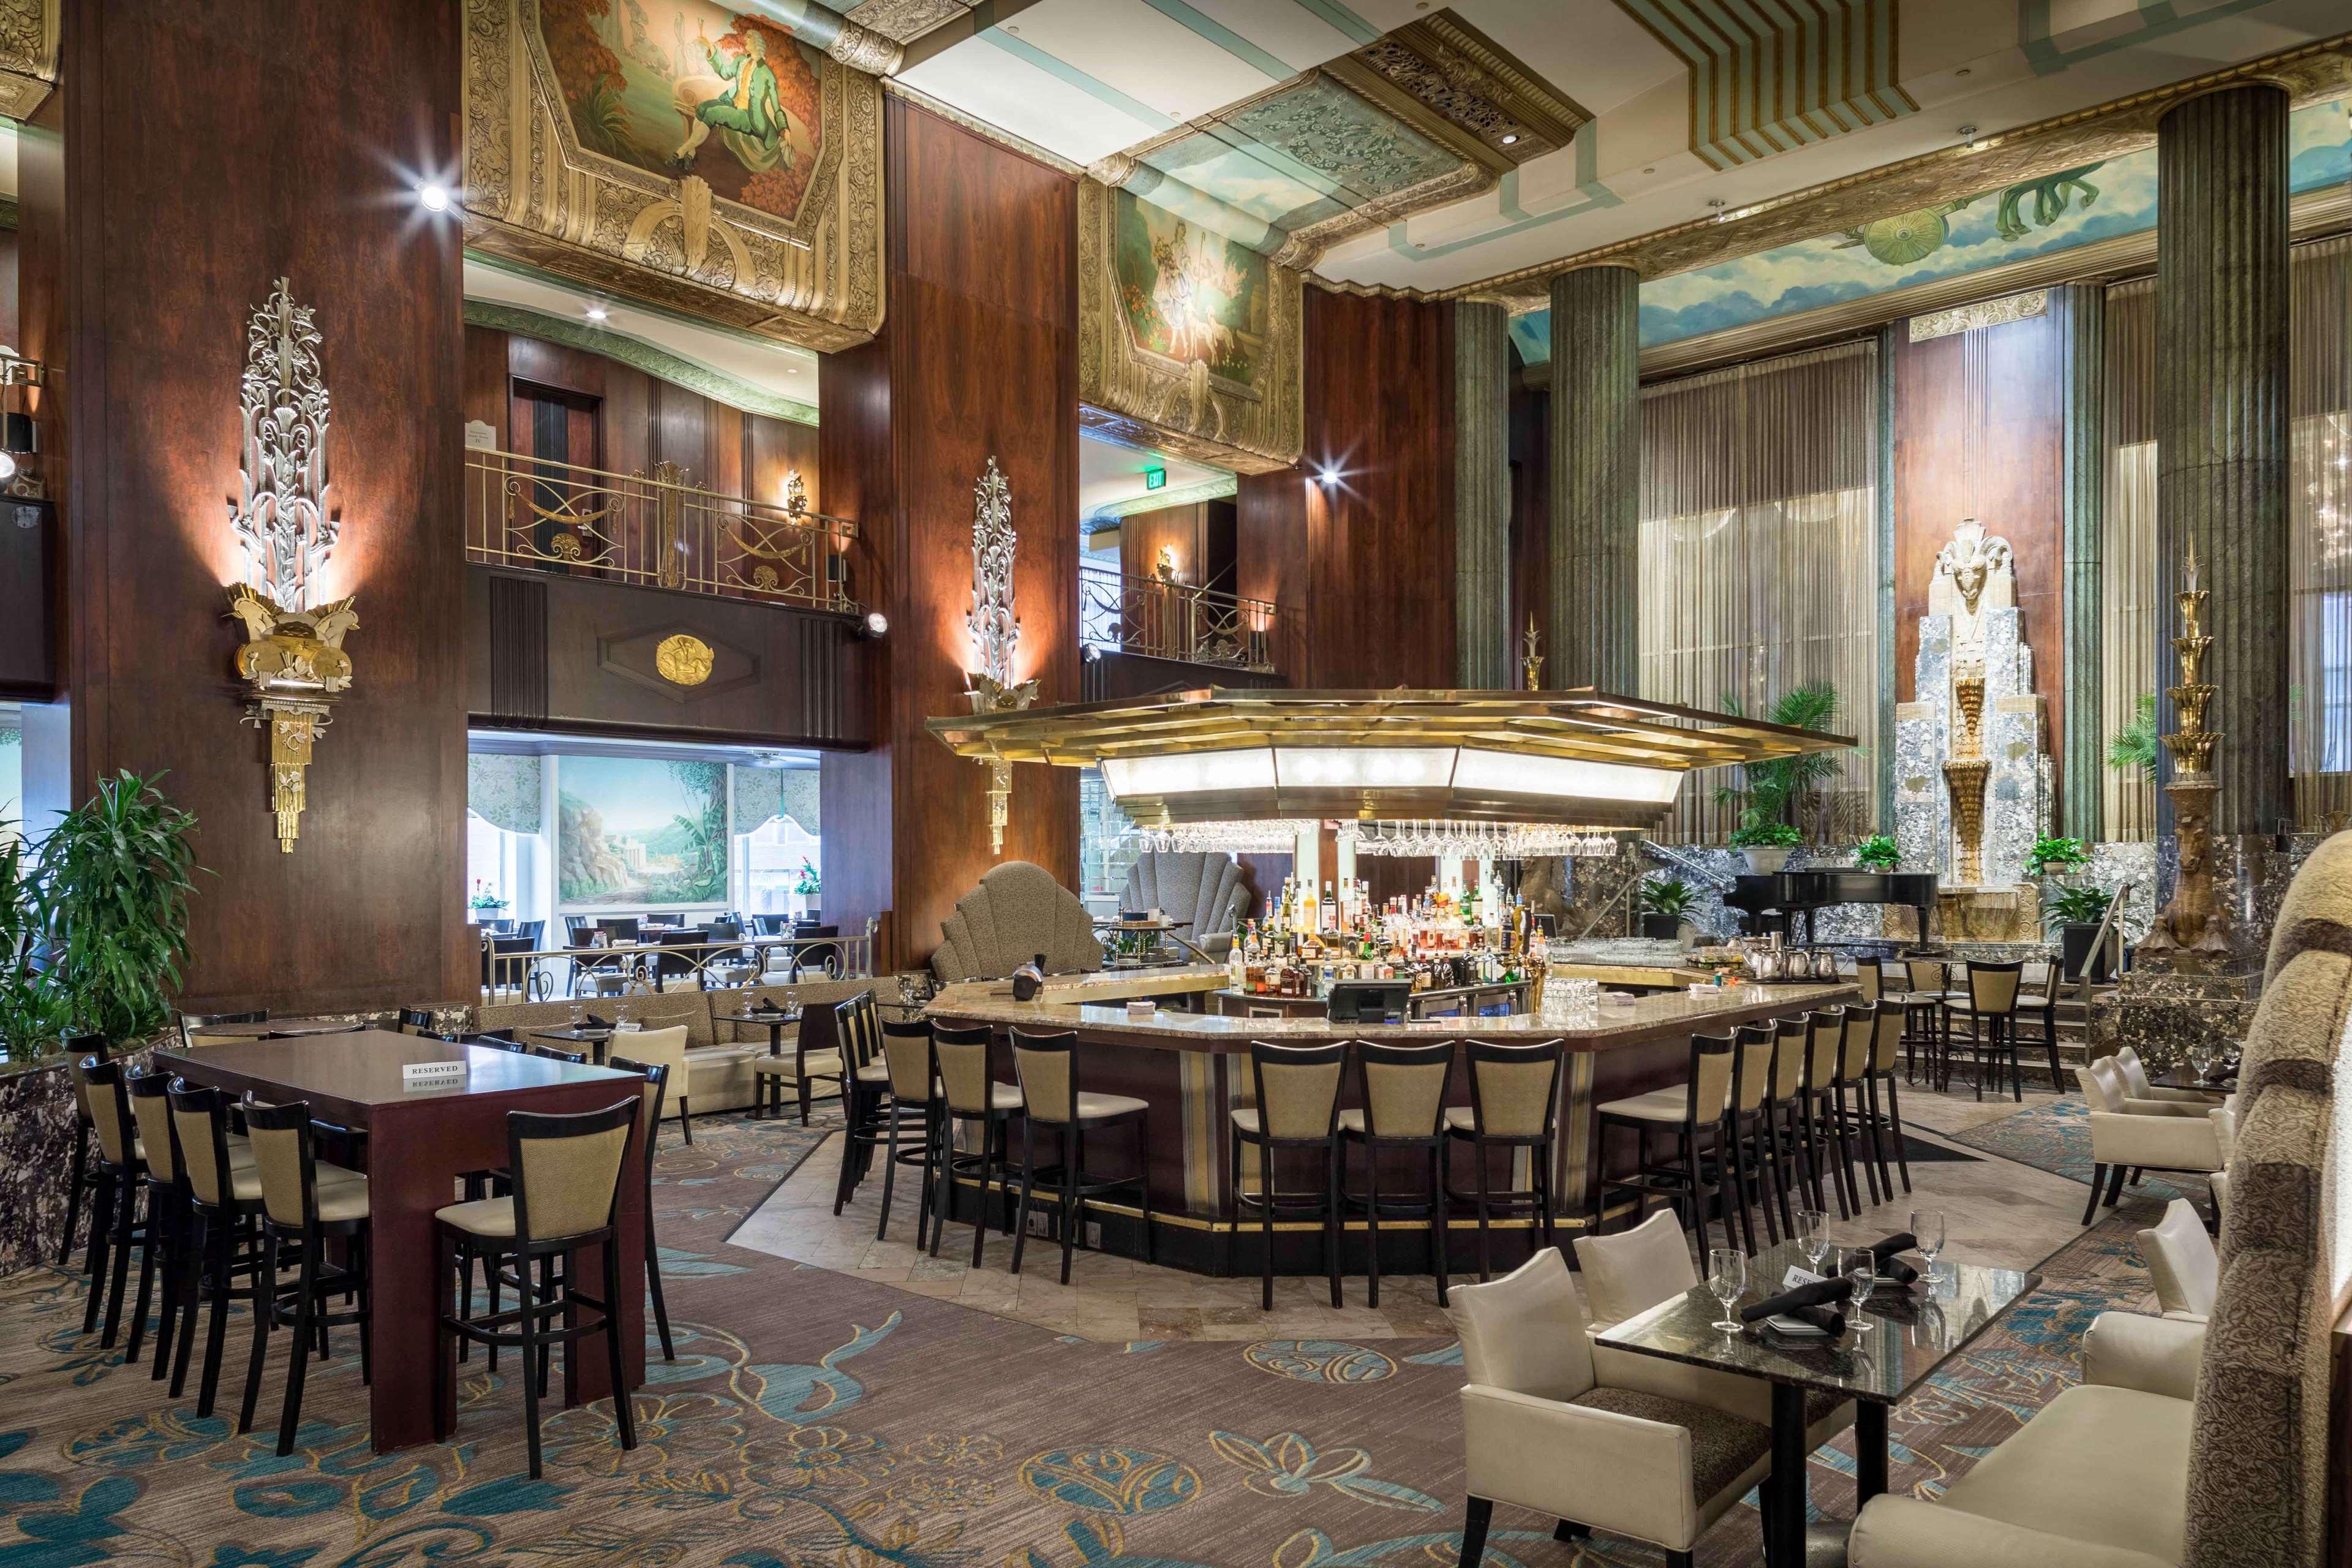 Hilton Cincinnati Netherland Plaza image 44